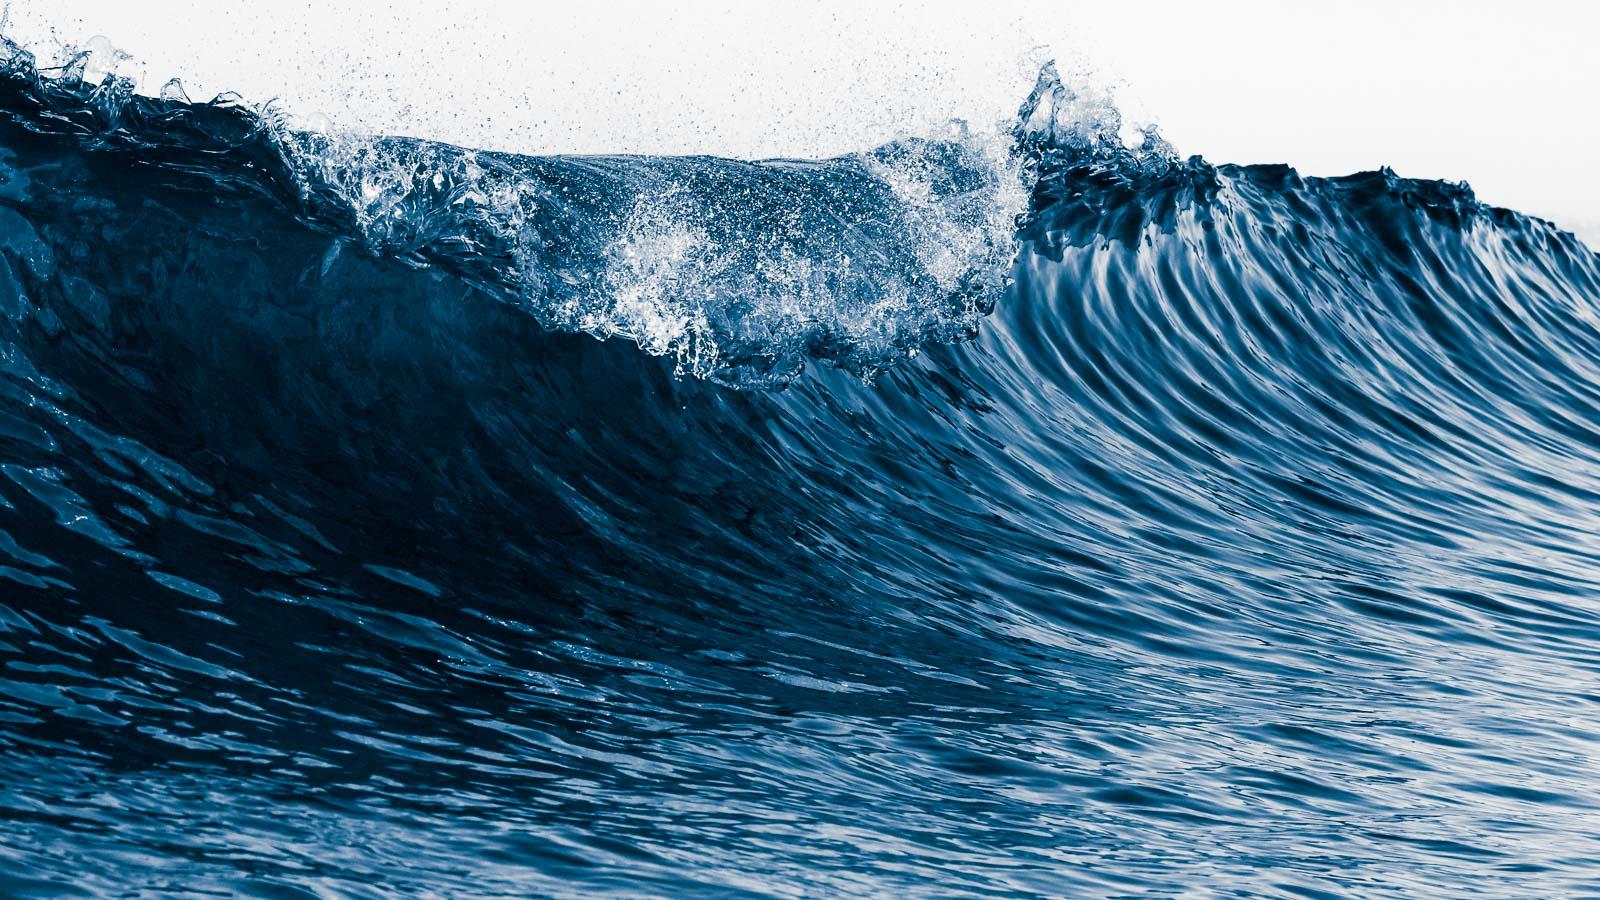 7_Newport-Beach-wave-art_Joseph-Barber-Photography.jpg